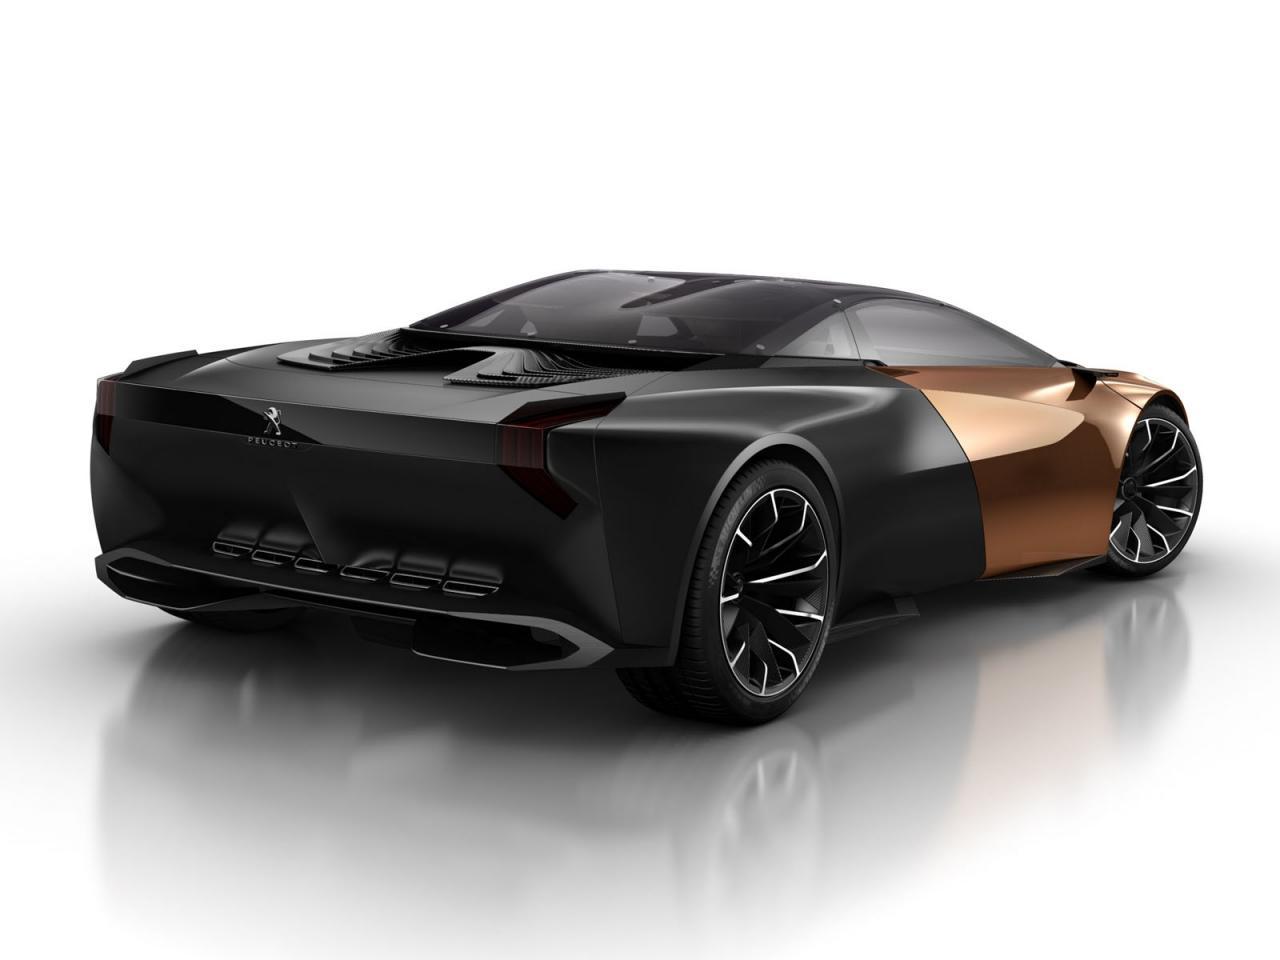 [Resim: Peugeot+Onyx+2.jpg]